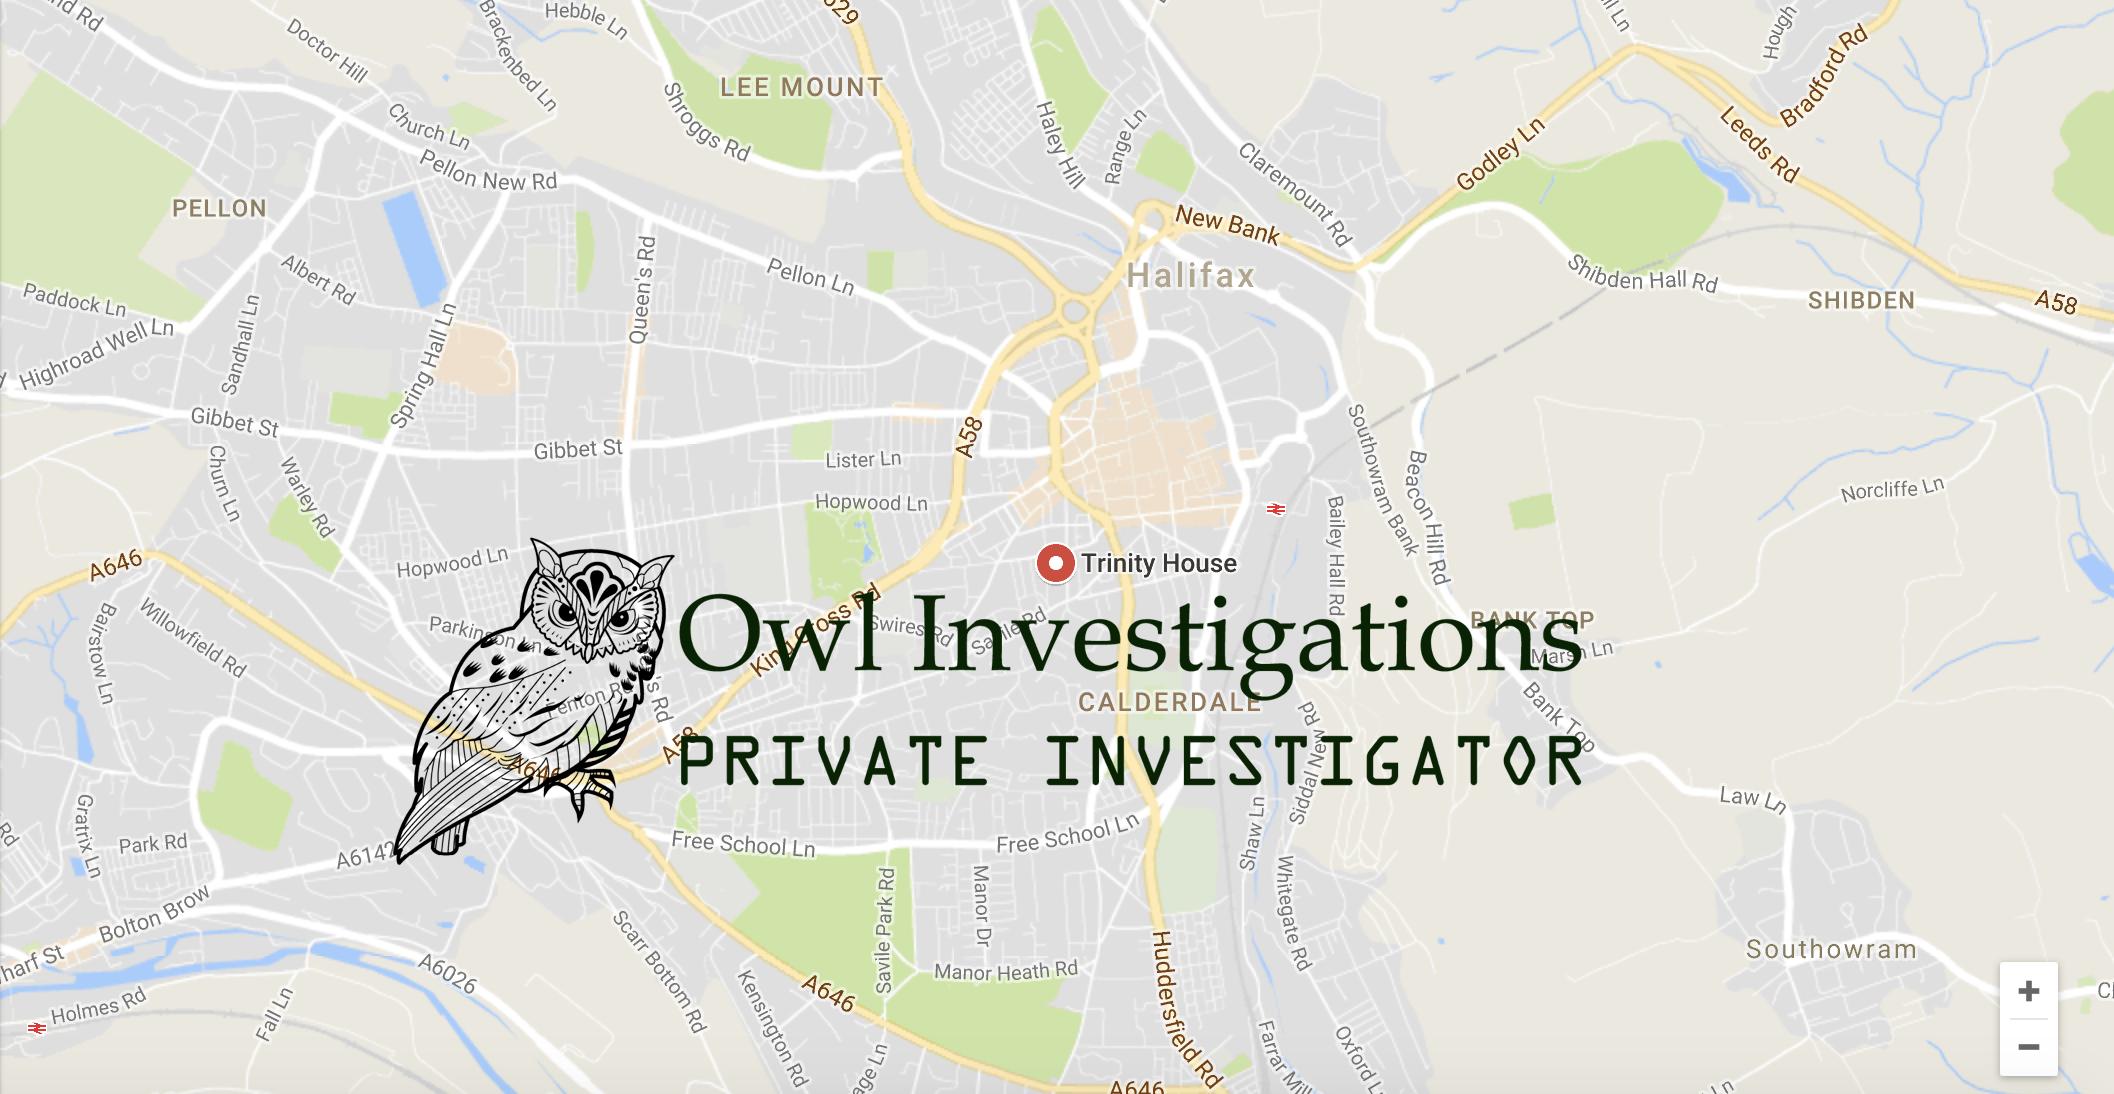 Private Investigator Halifax, Bradford, Huddersfield, Wakefield and Leeds